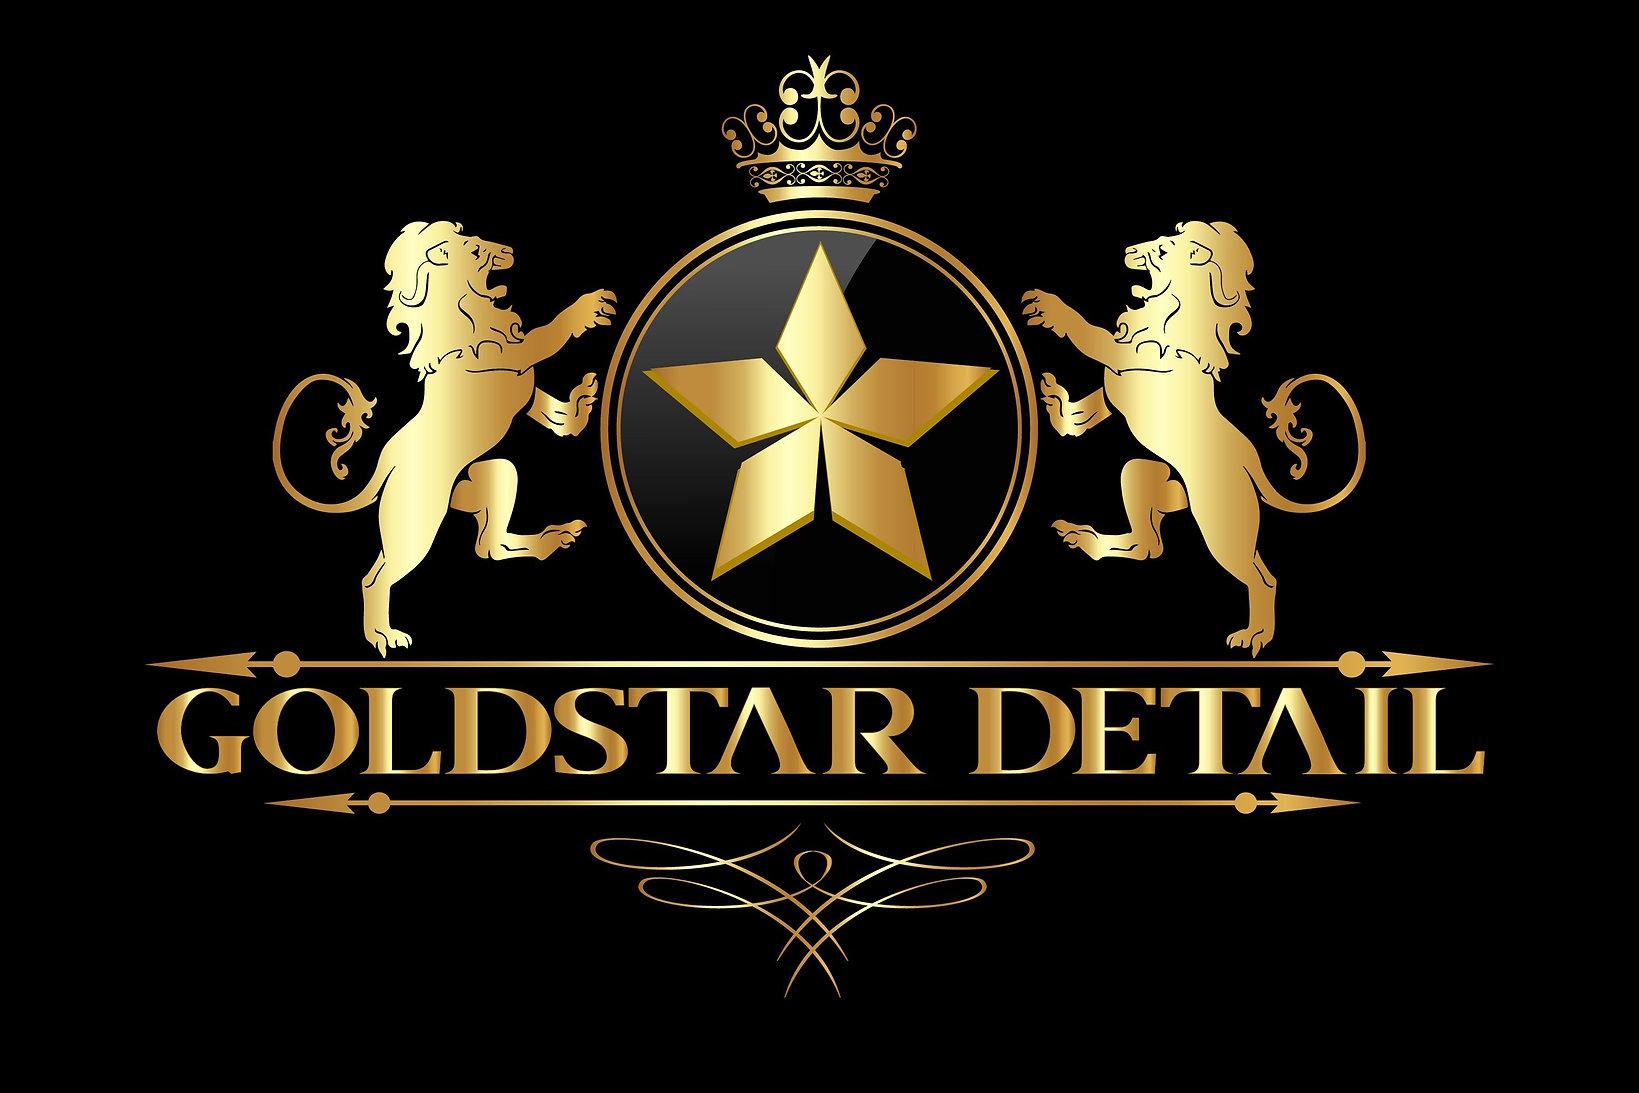 GoldStar Detail 2021 Summer Lion Logo